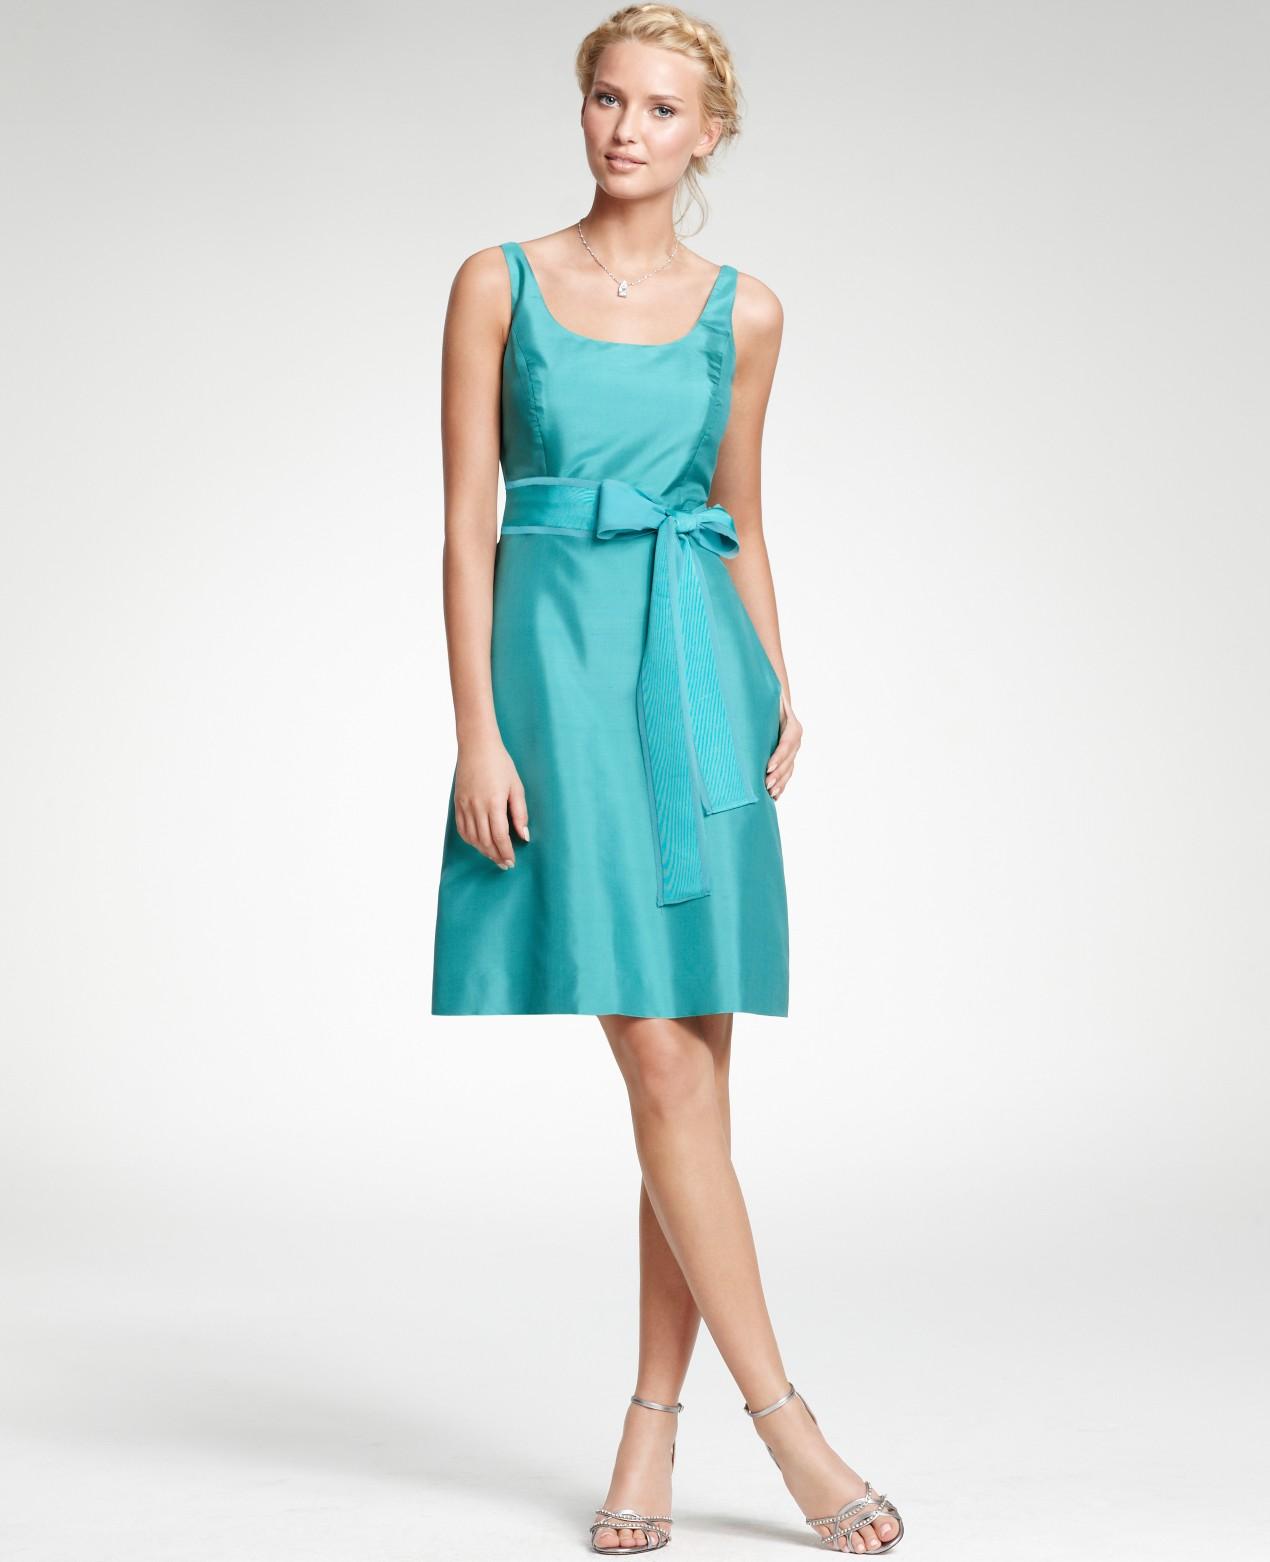 Ann Taylor Silk Dupioni Scoop Neck Bridesmaid Dress in